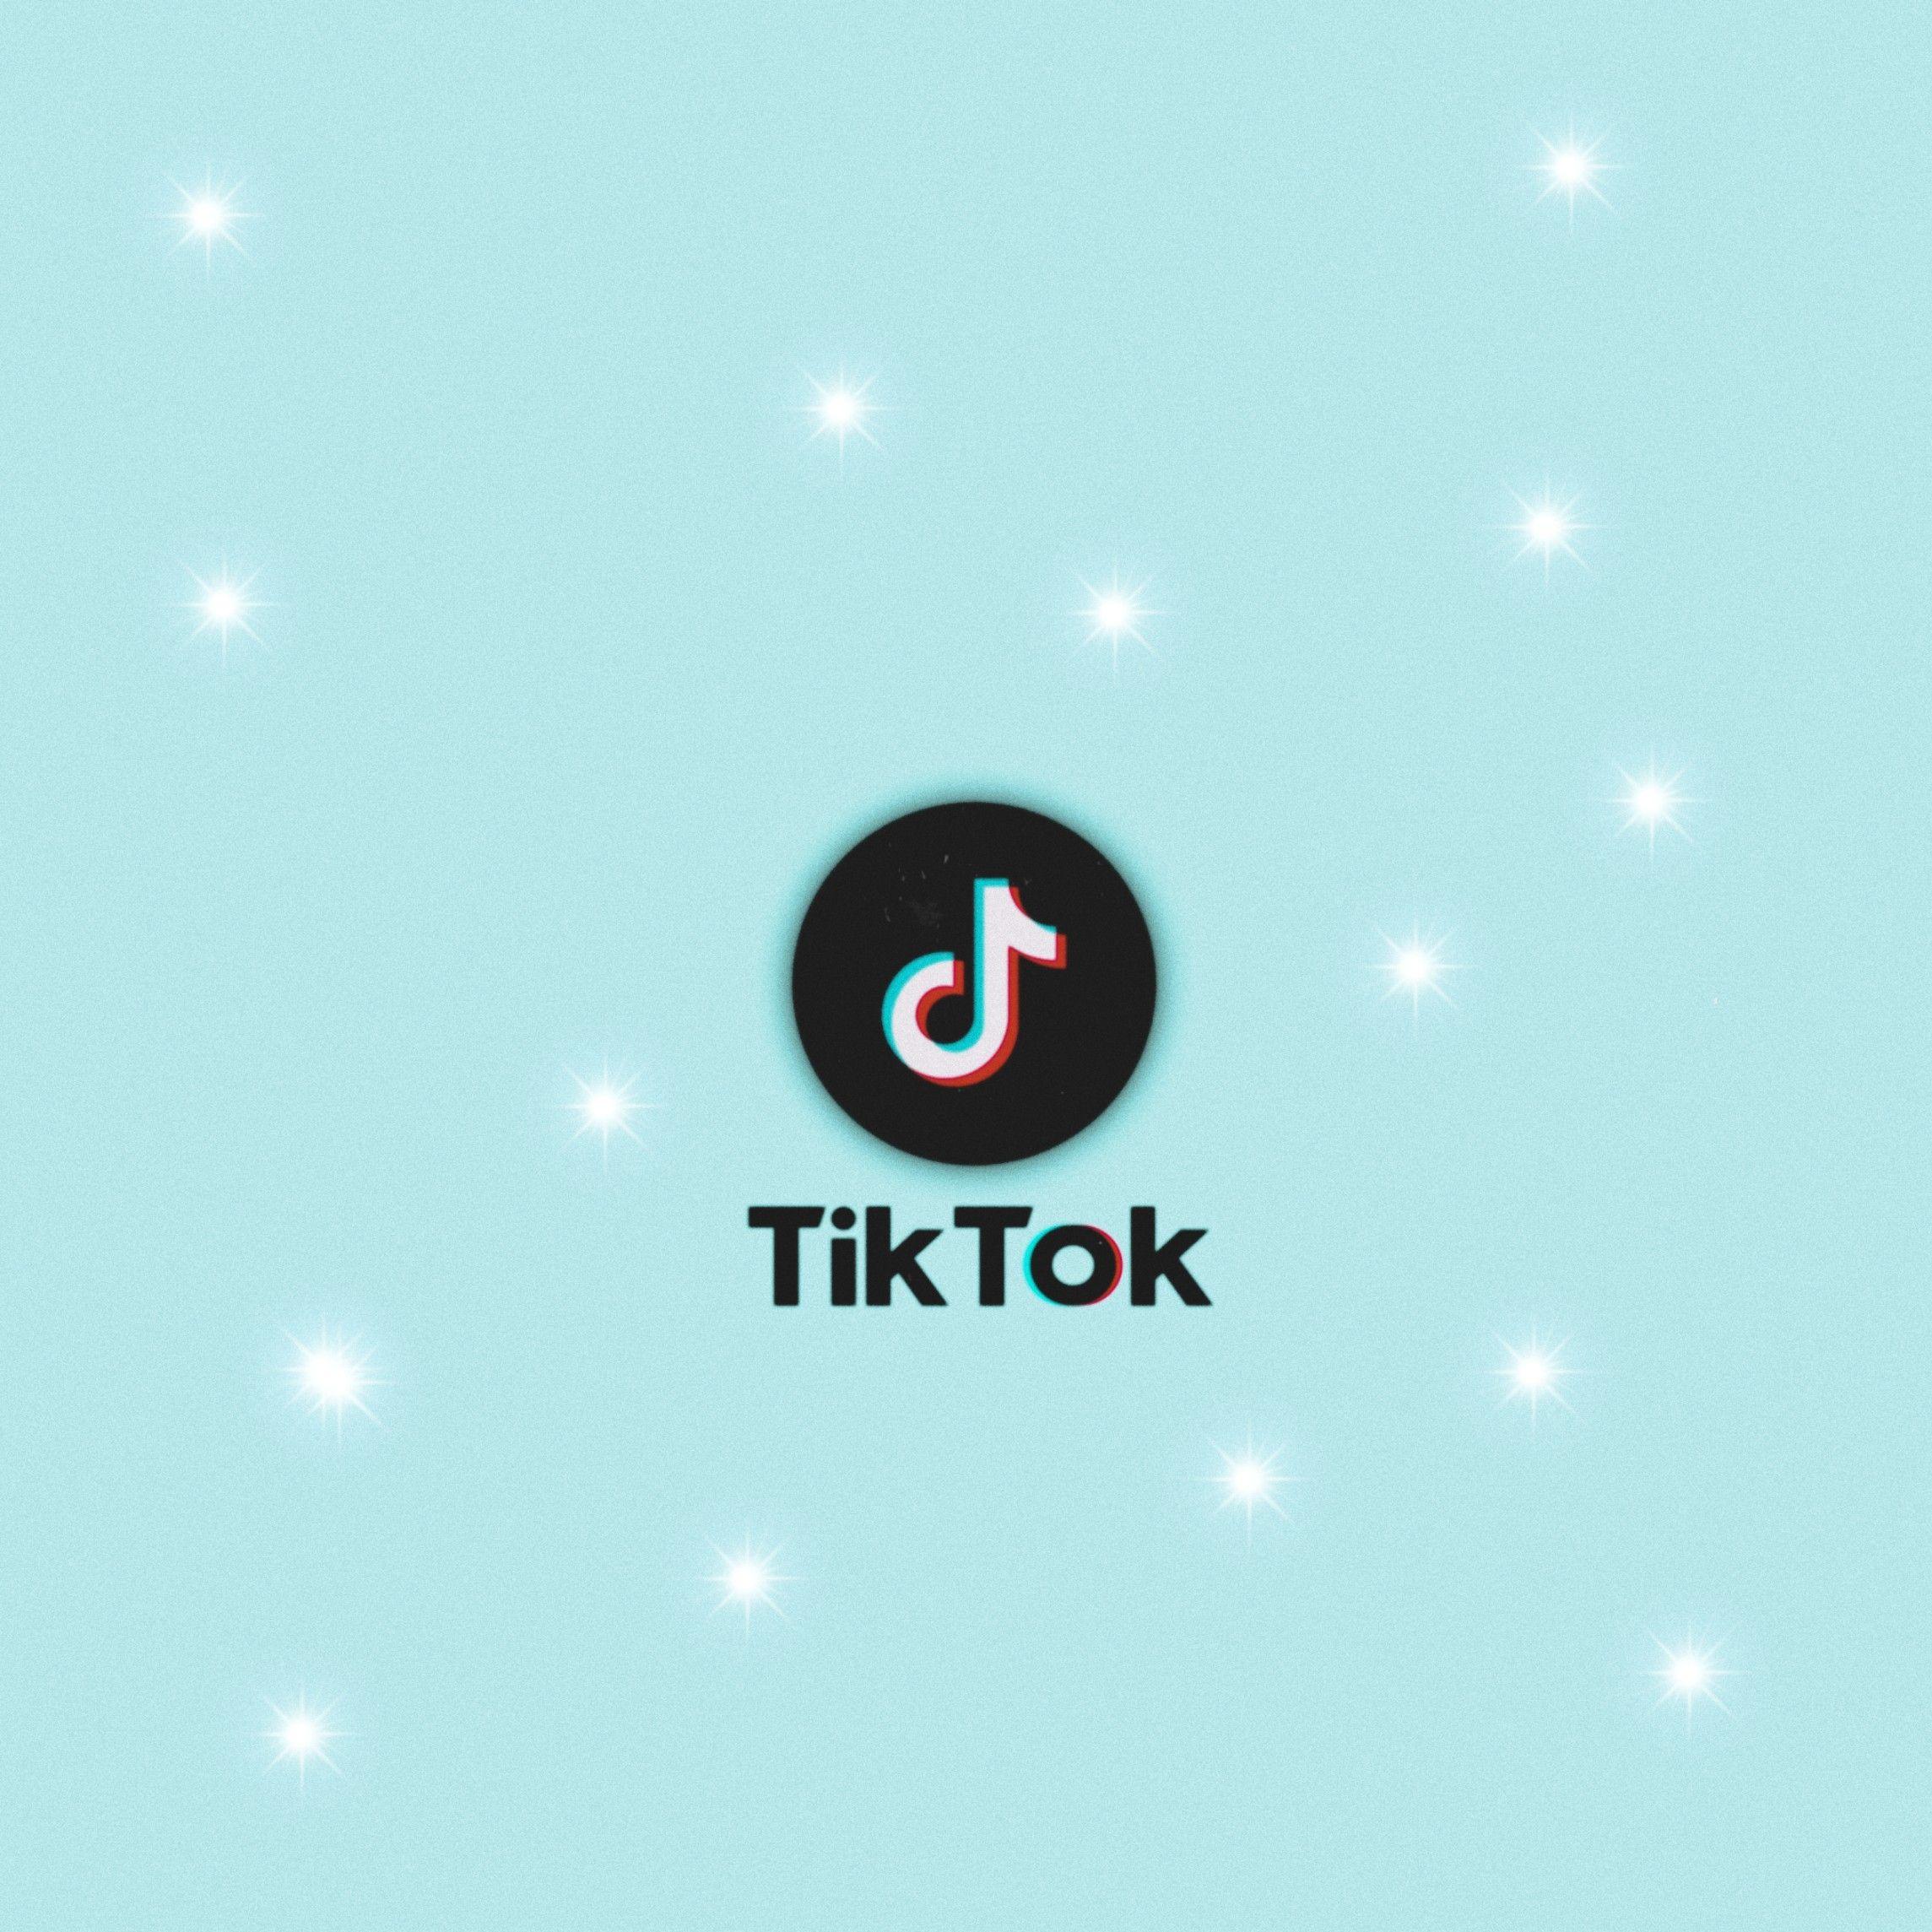 Tiktok Wallpapers Wallpaper Cave